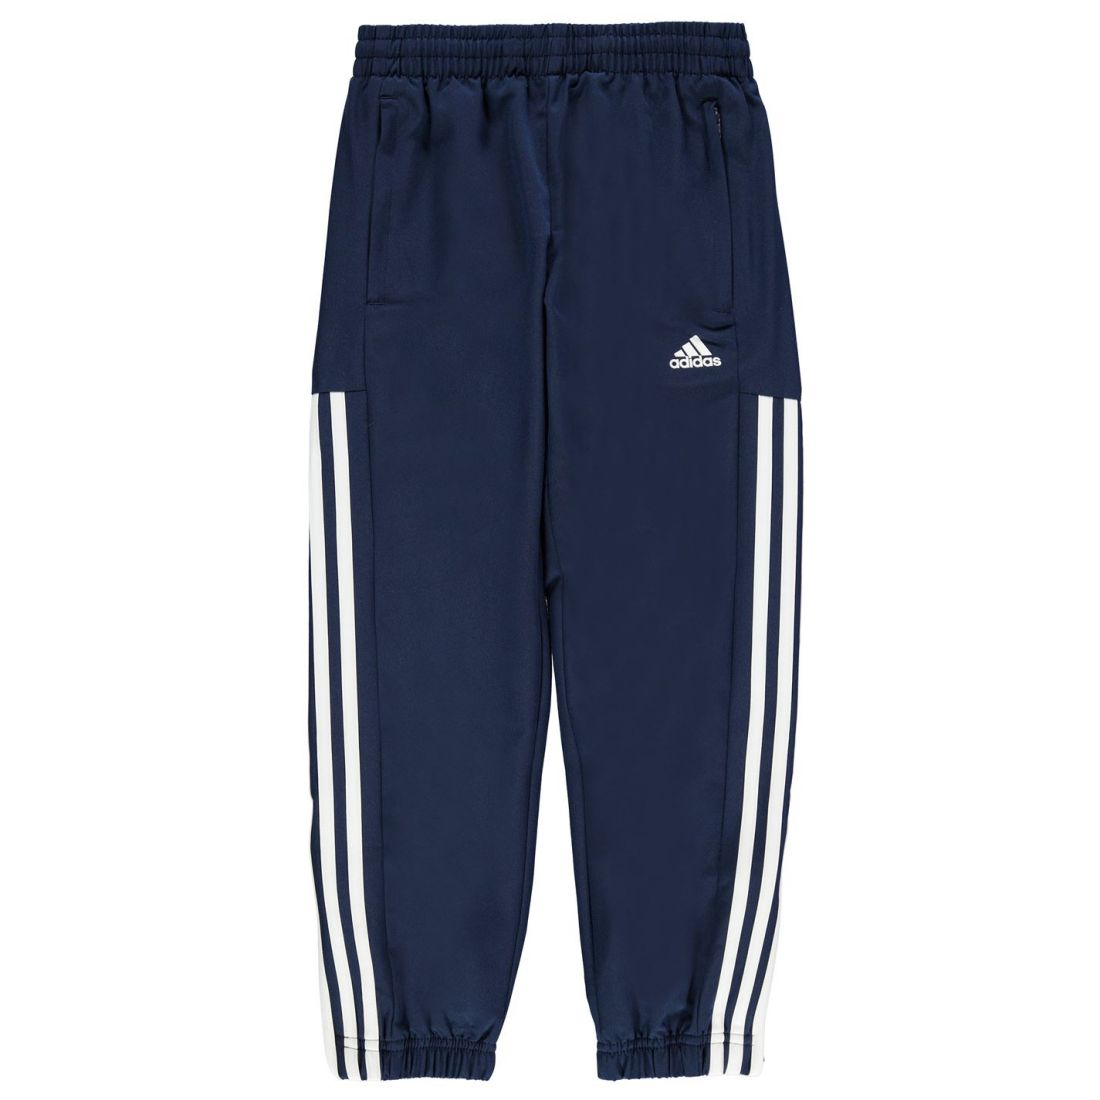 80824cc7012a adidas Samson 2 Sweat Pants Junior Mesh Lining Casual Boys Children 2 2 di  10 ...